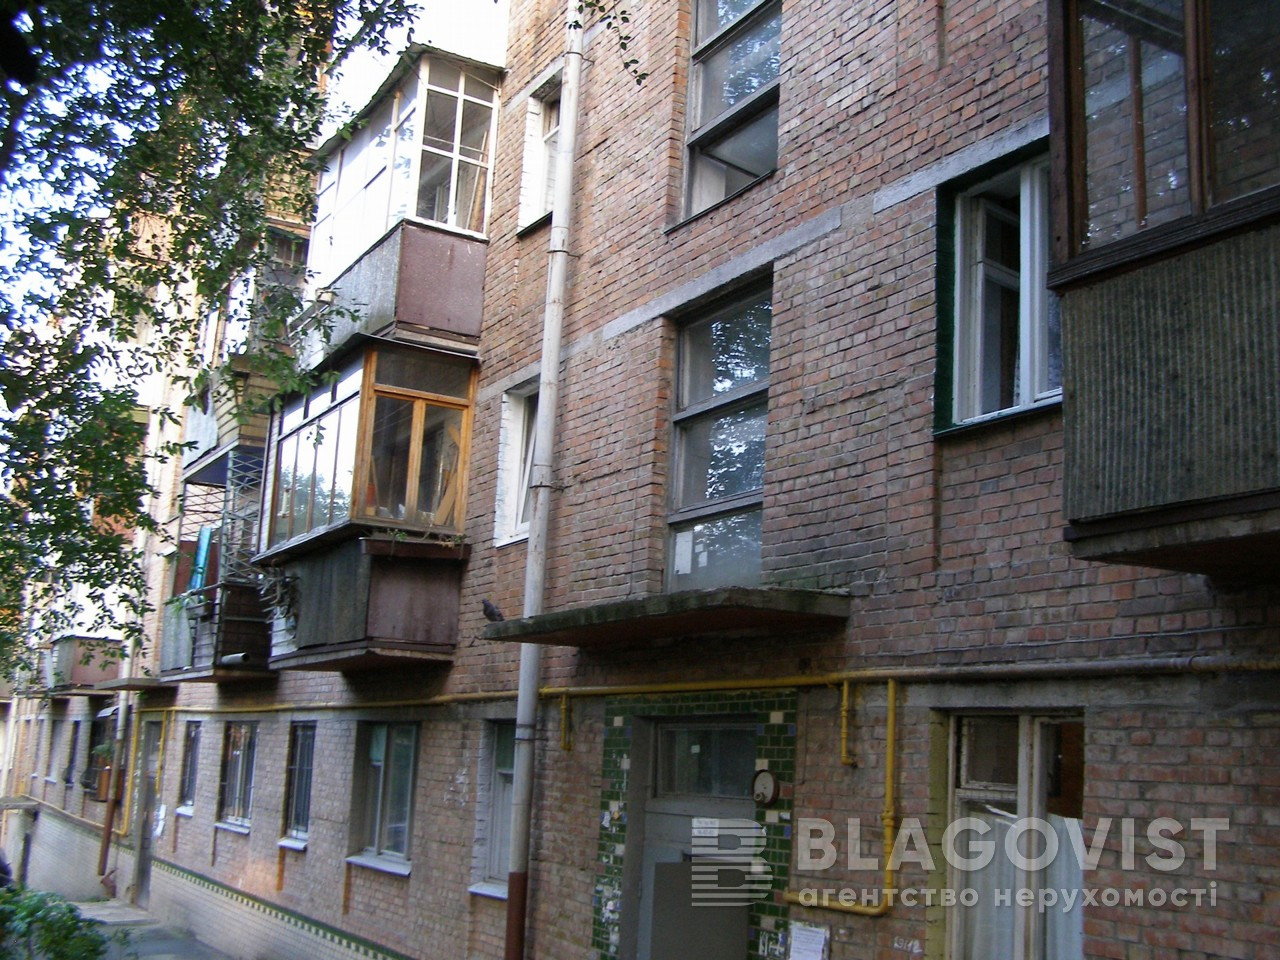 Нежитлове приміщення, M-31649, Довнар-Запольського Митрофана, Київ - Фото 1